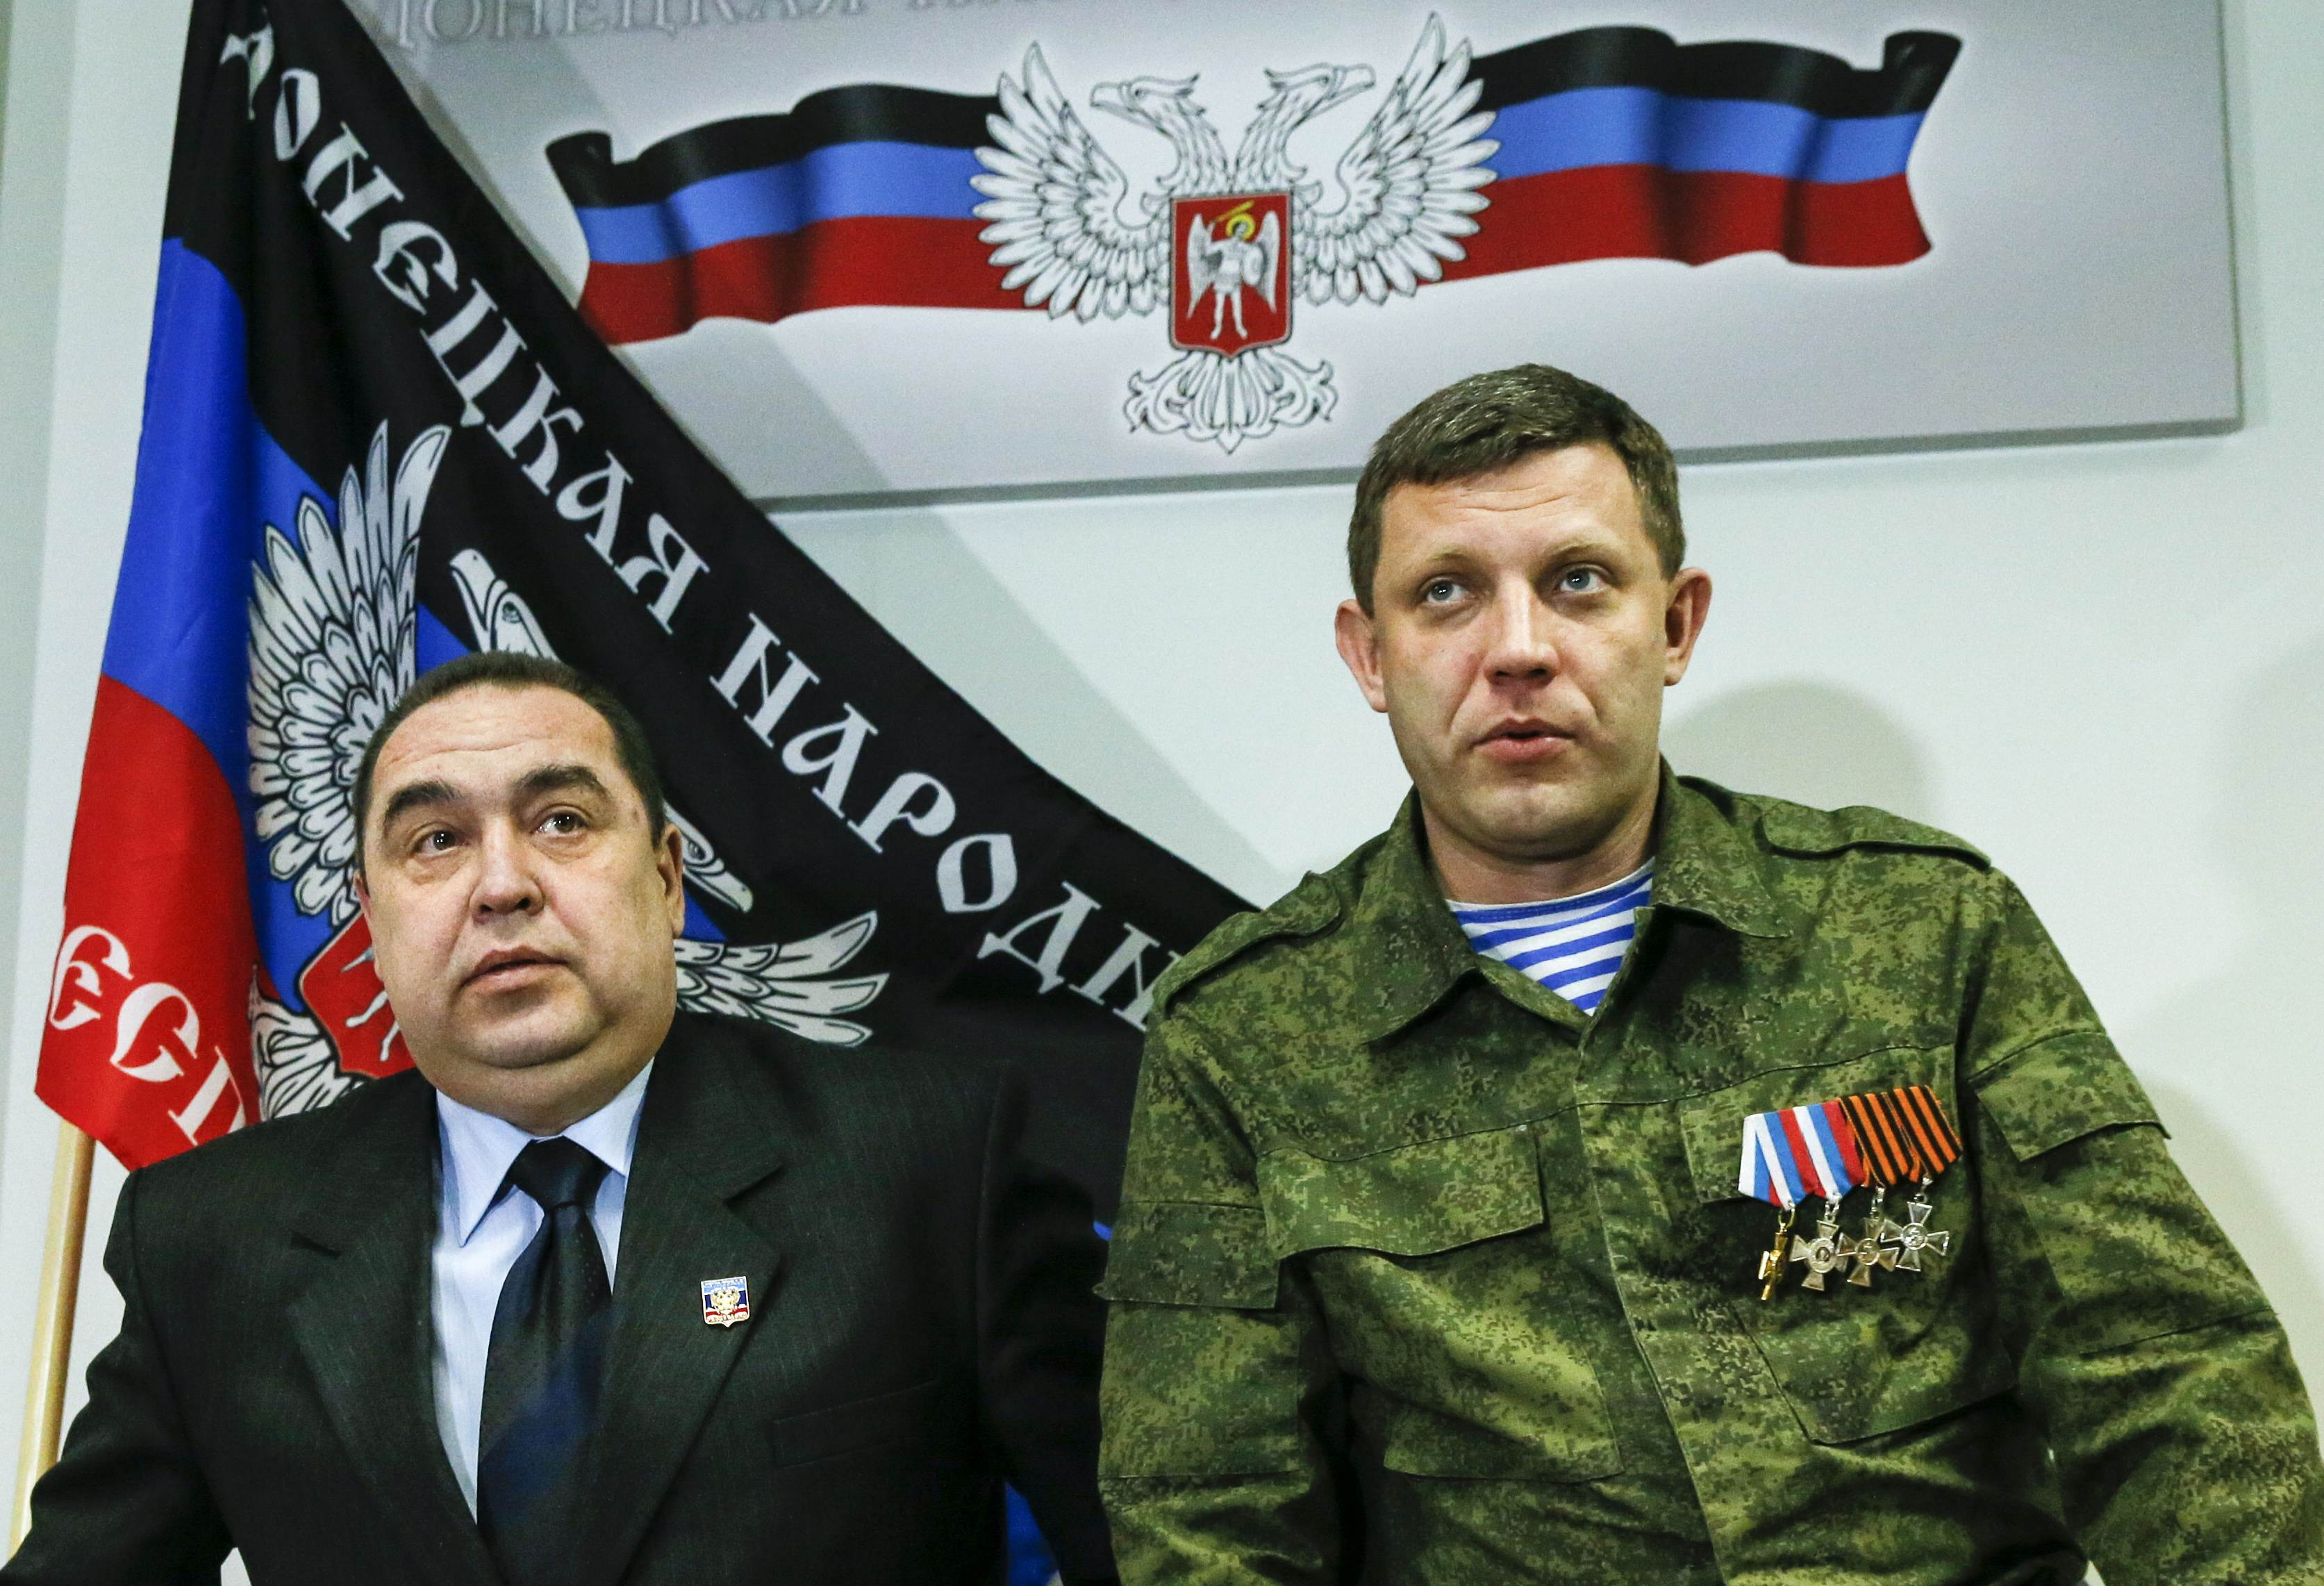 A sinistra Igor Plotnitsky, leader della Repubblica Popolare di Luhansk. A destra Alexander Zakharchenko, leader della Repubblica Popolare di Donetsk